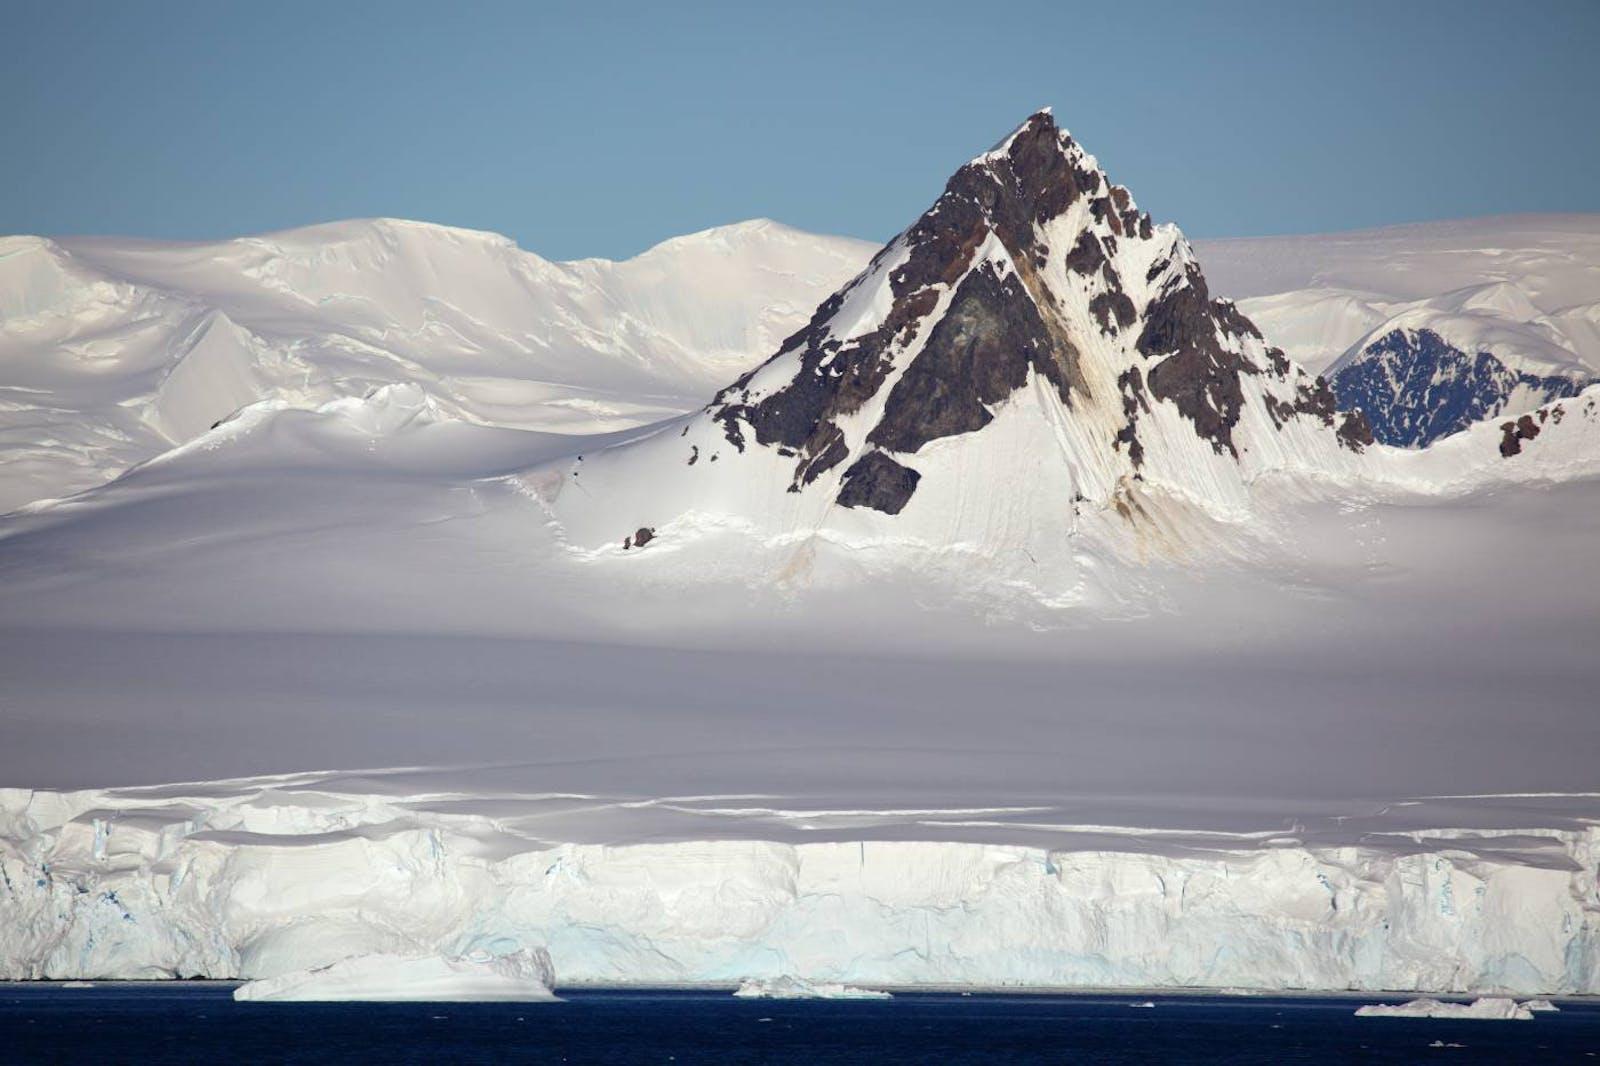 Central South Antarctic Peninsula Tundra